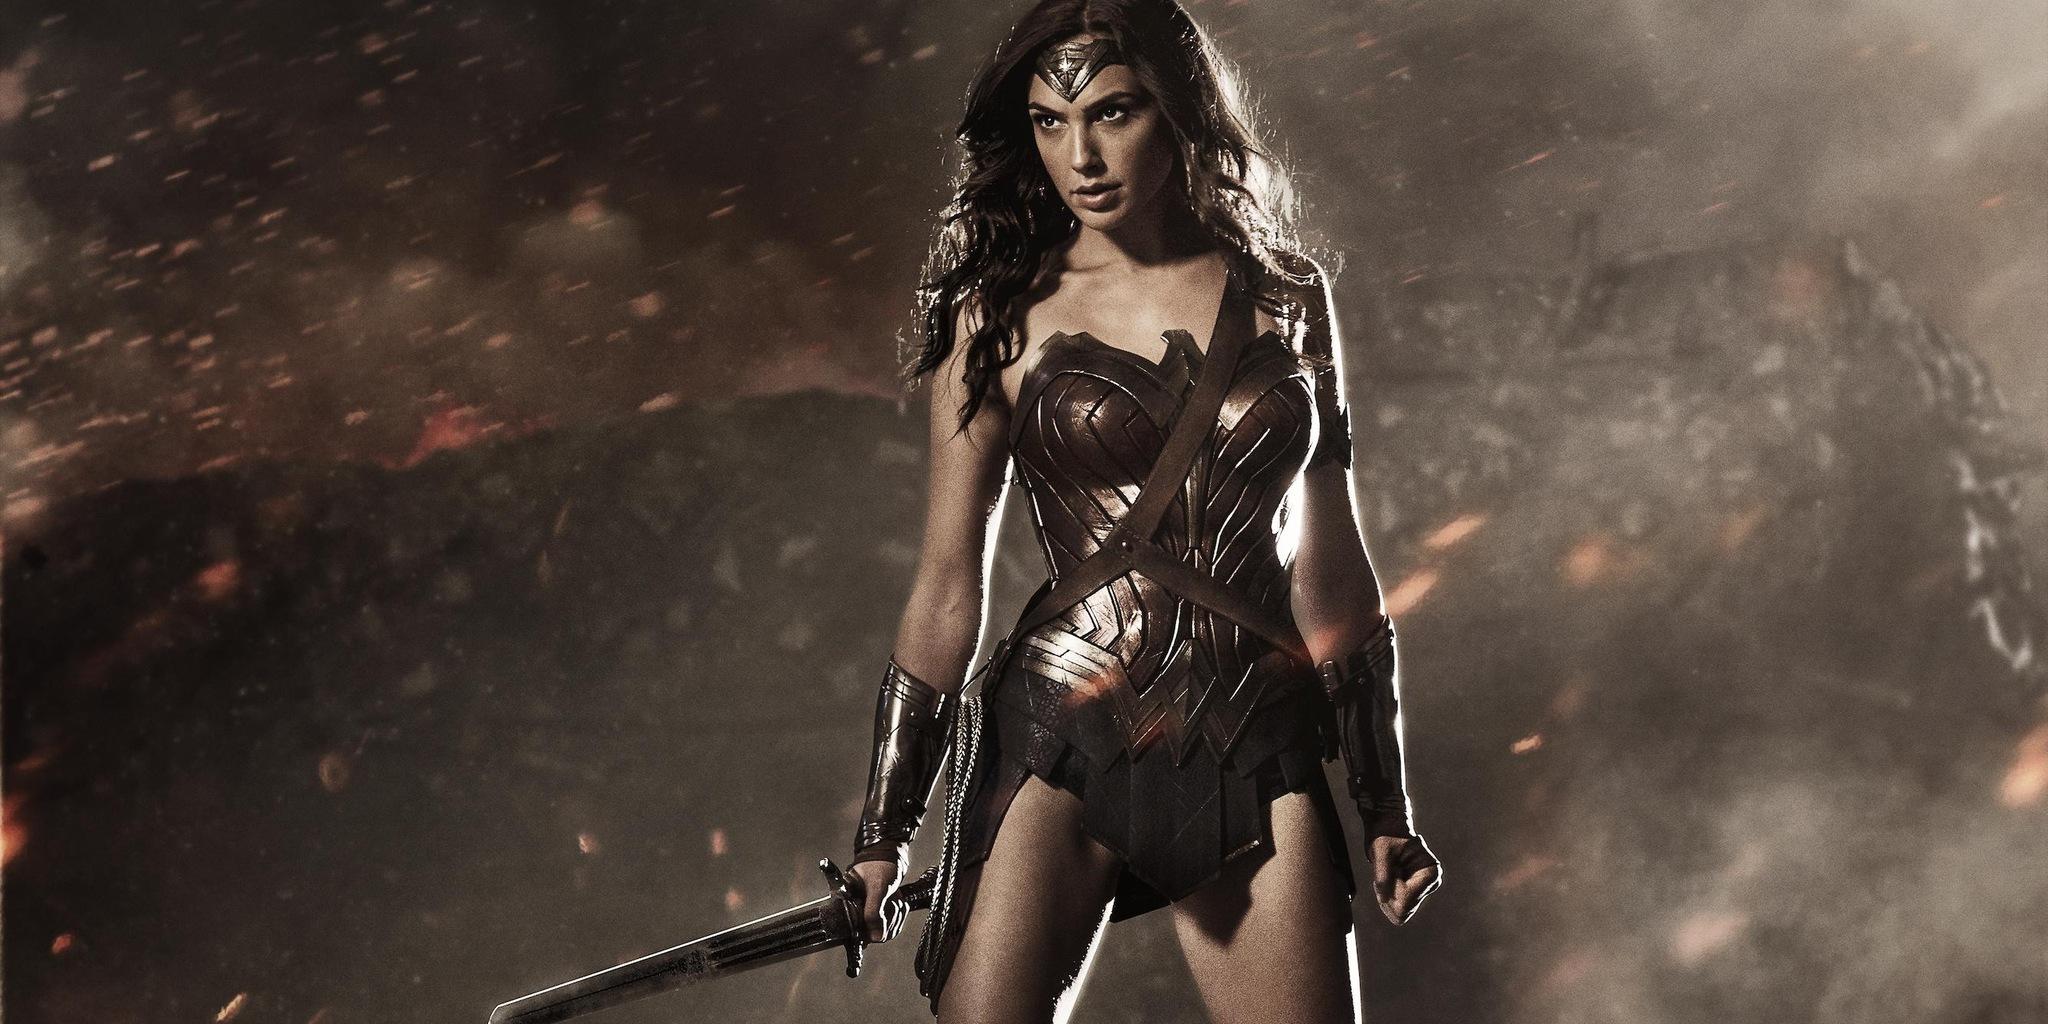 dc comics movies after justice league wonder woman